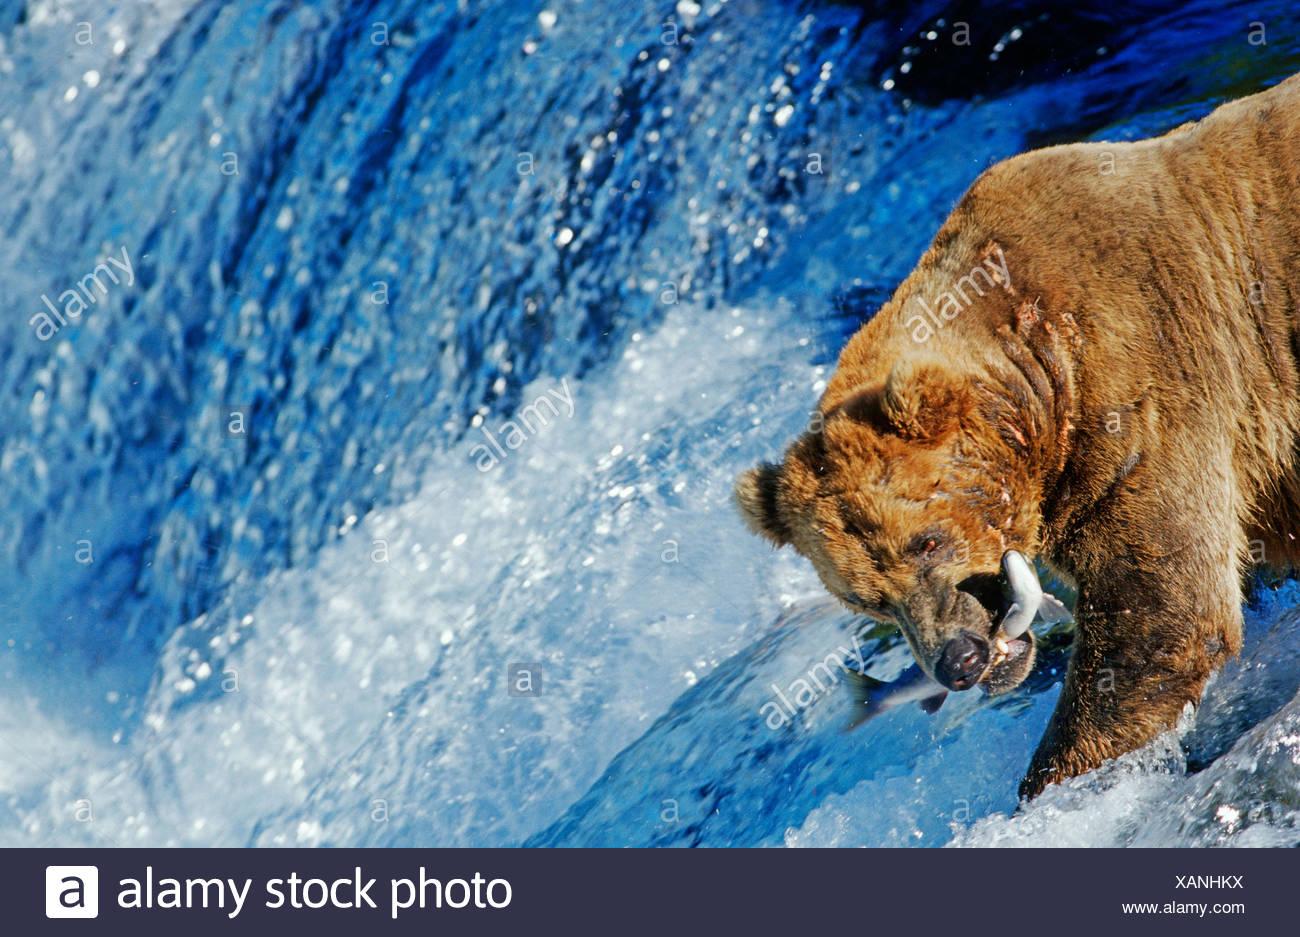 Oso pardo (Ursus arctos) captura de salmón que salta hasta una cascada, N.P. Katmai, Alaska Imagen De Stock